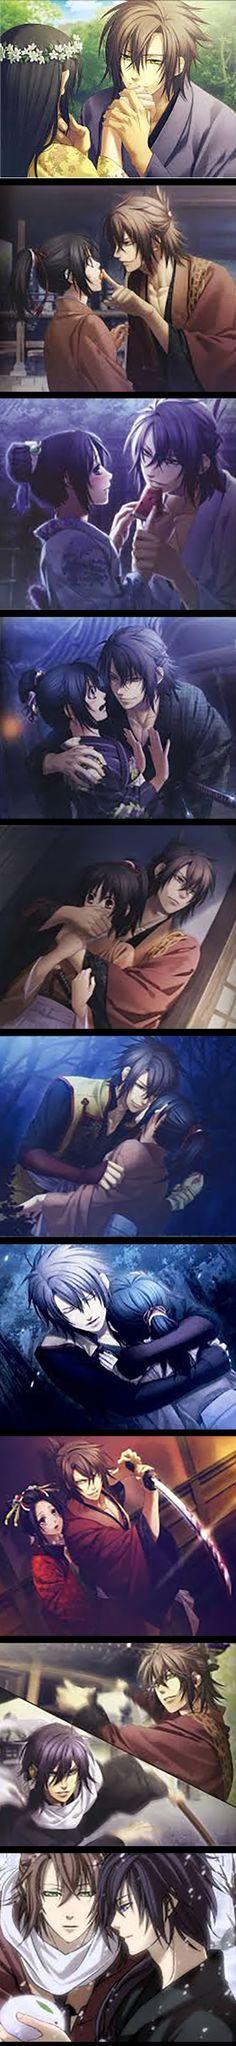 Souji Okita I love hiiimm ! can't you tell? LOL